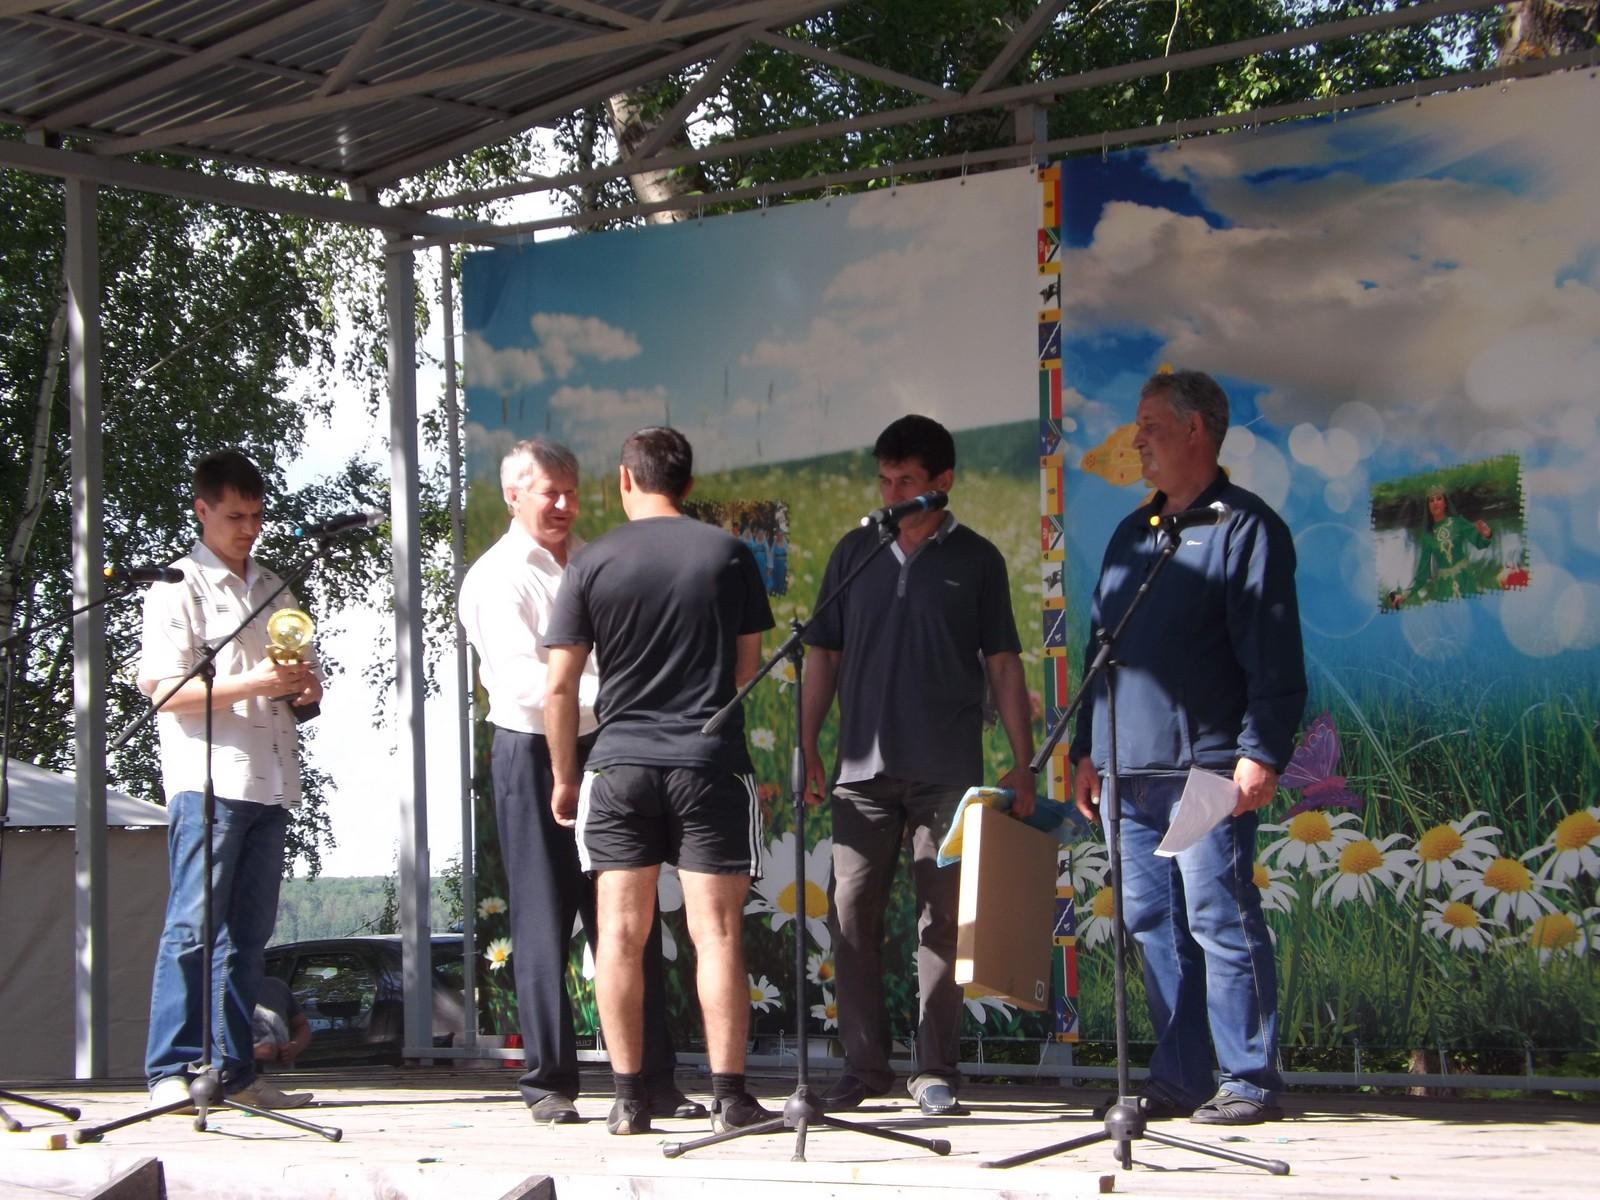 Sabantuy-2016-bor'ba-na-poyasax-i-dr-sostyazaniya-499-Bastanovo